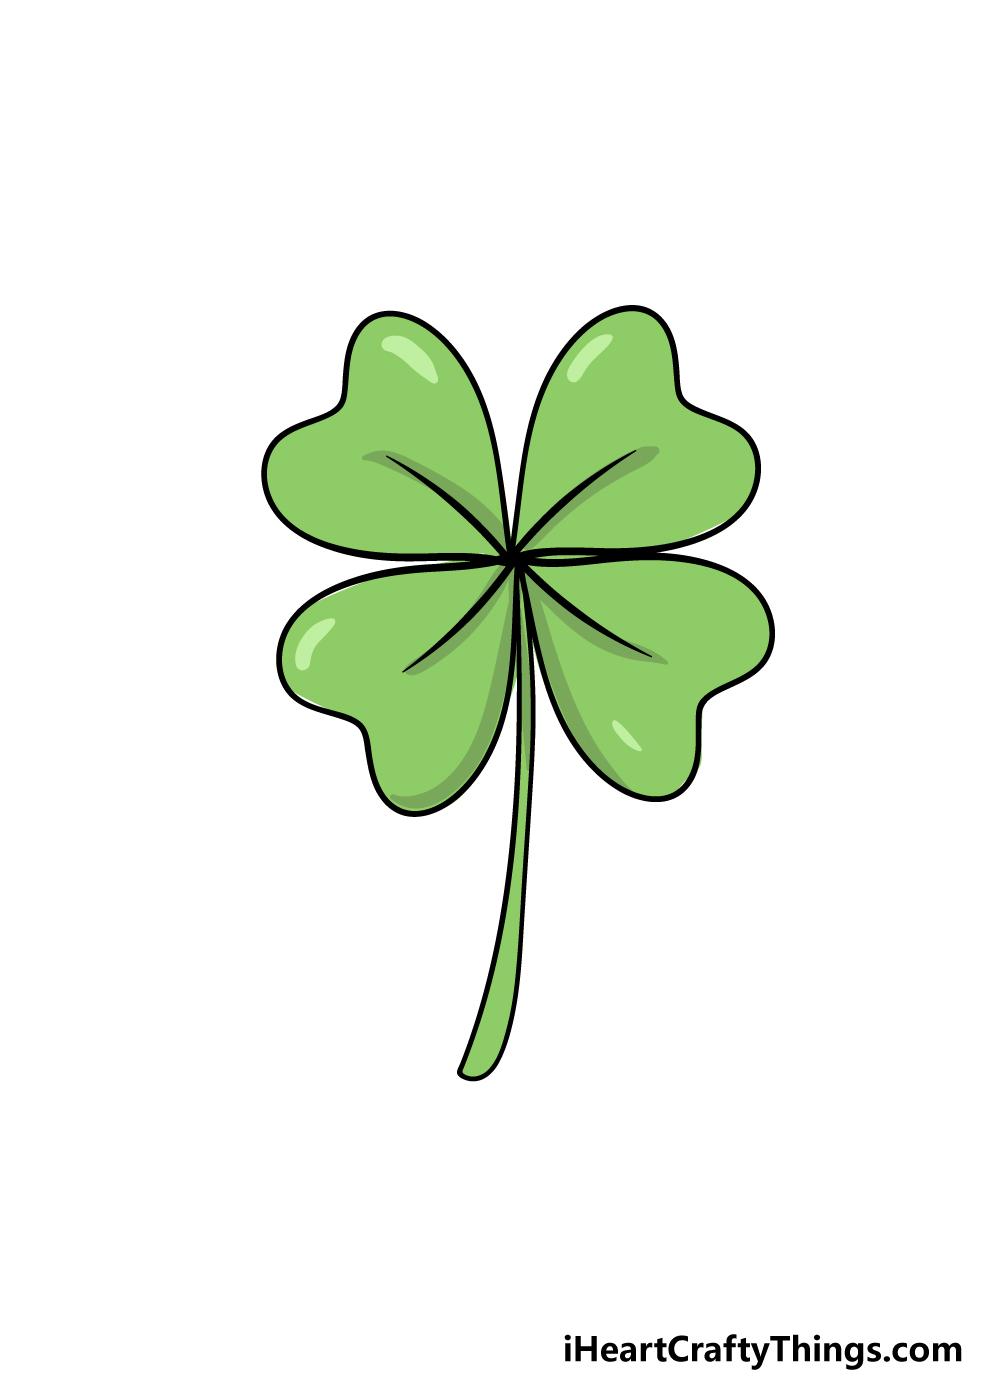 drawing four-leaf clover step 7